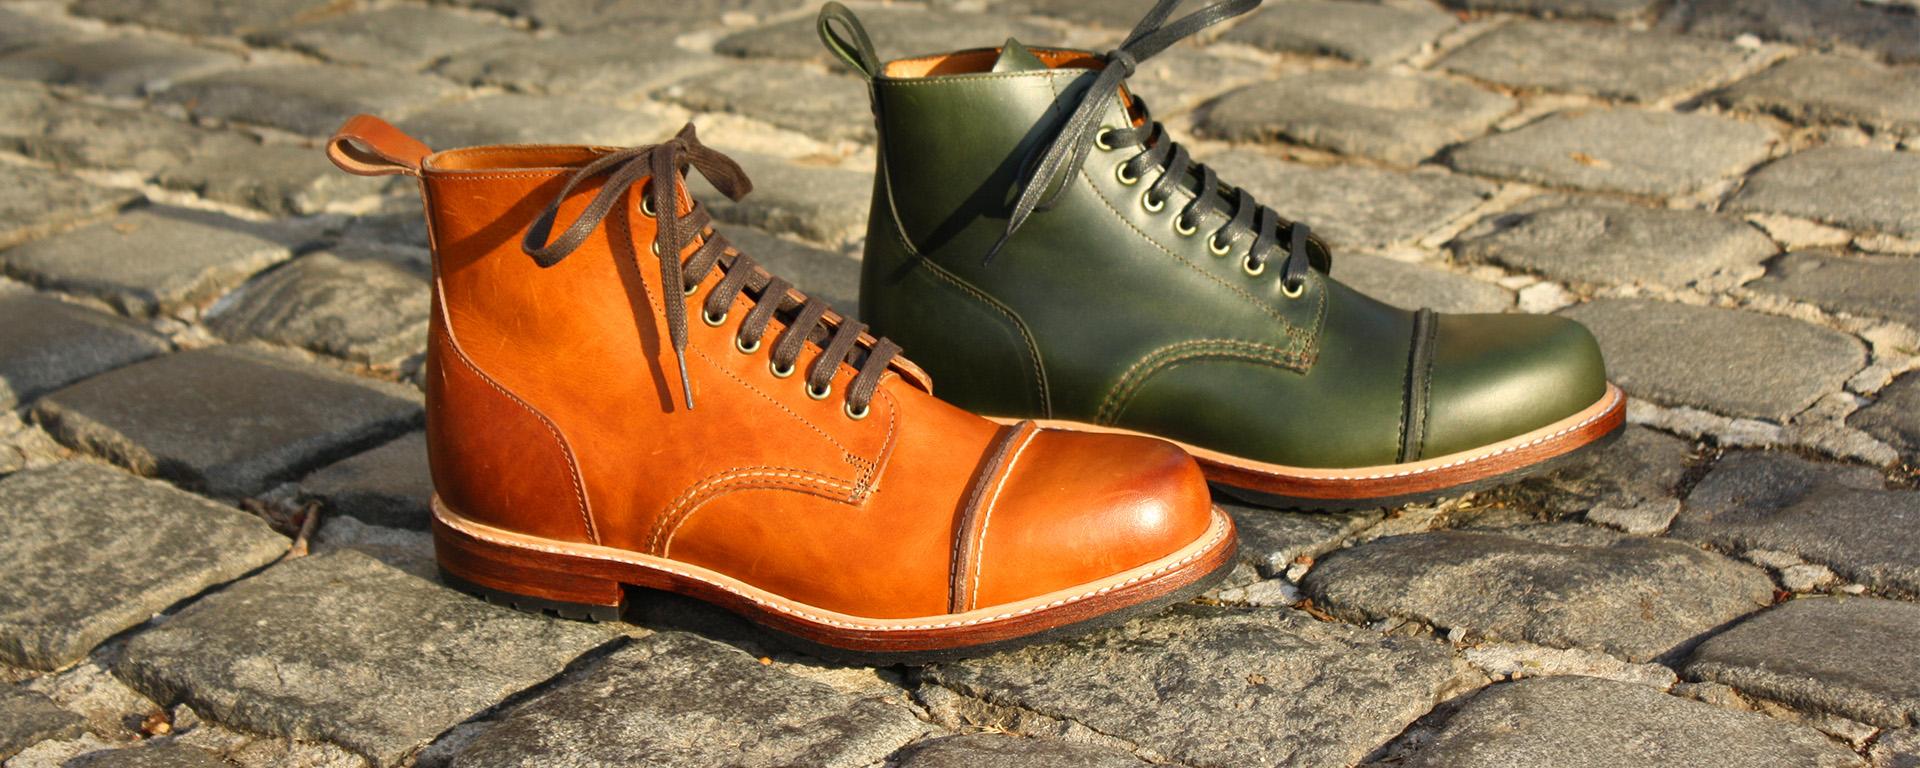 Noah Waxman American luxury shoemaker handmade Hudson boots